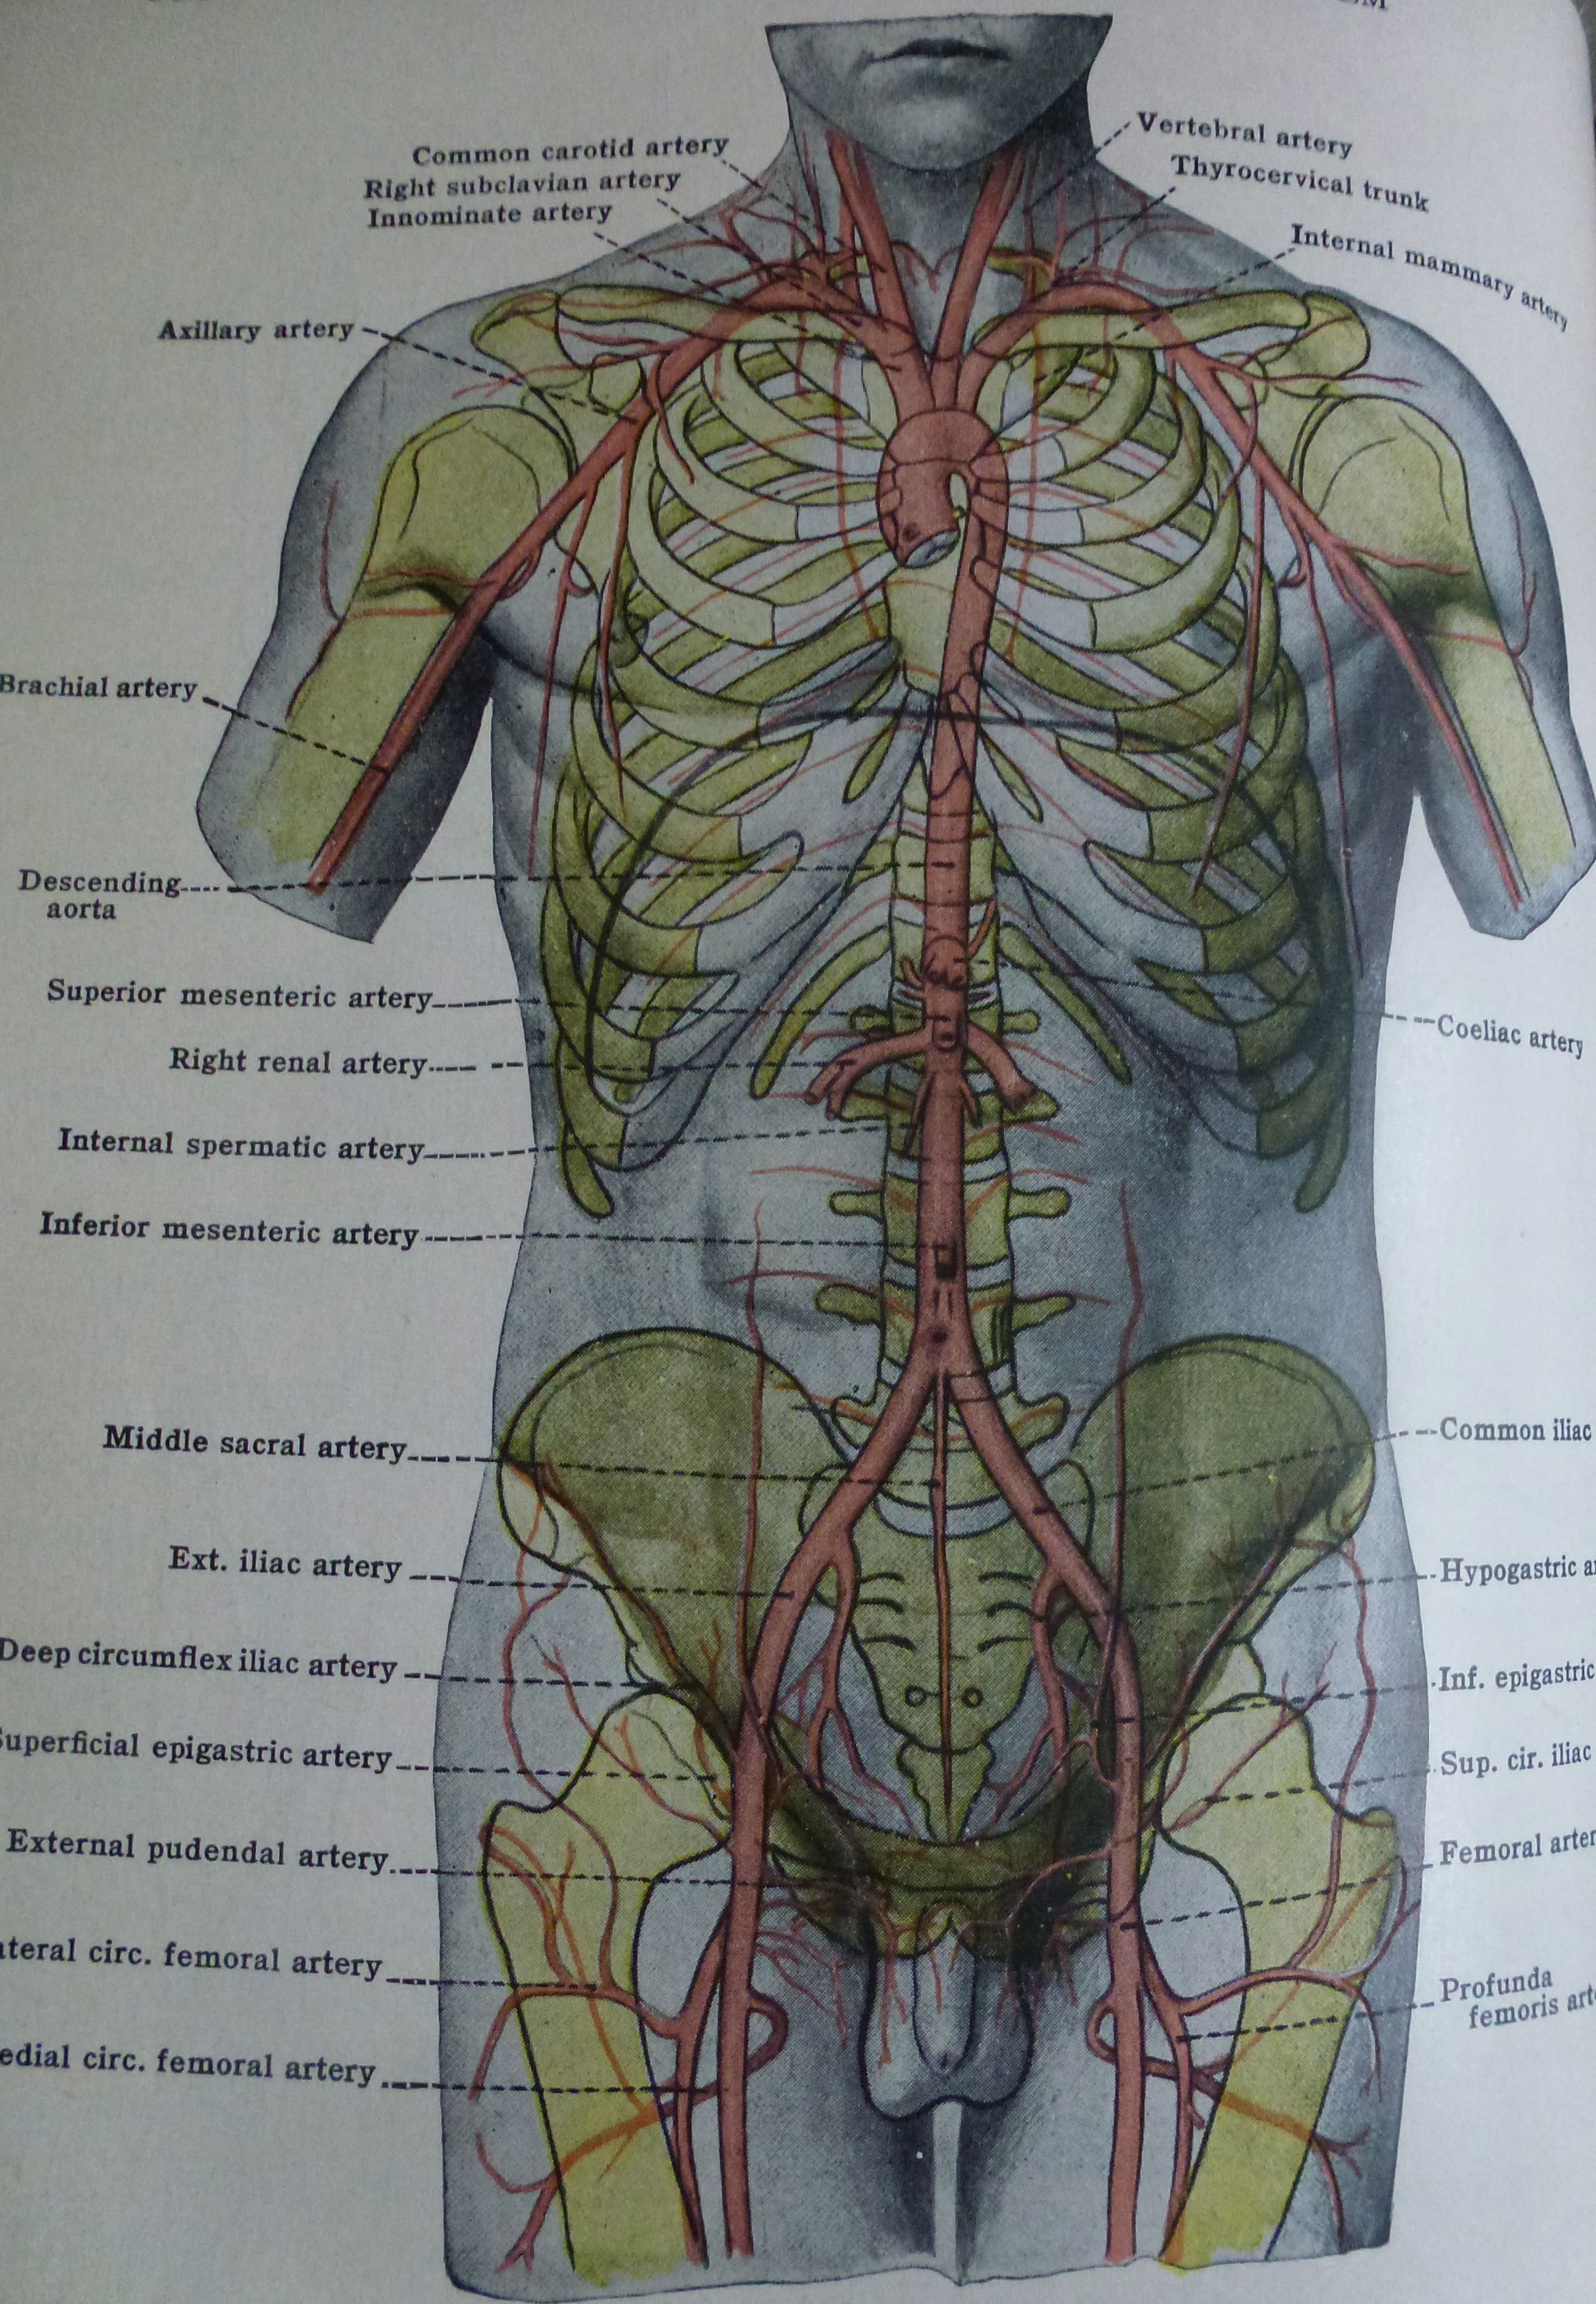 mEDICAL bOOK eMBRYOLOGY #arteries #medicaldiagram #humanbody ...